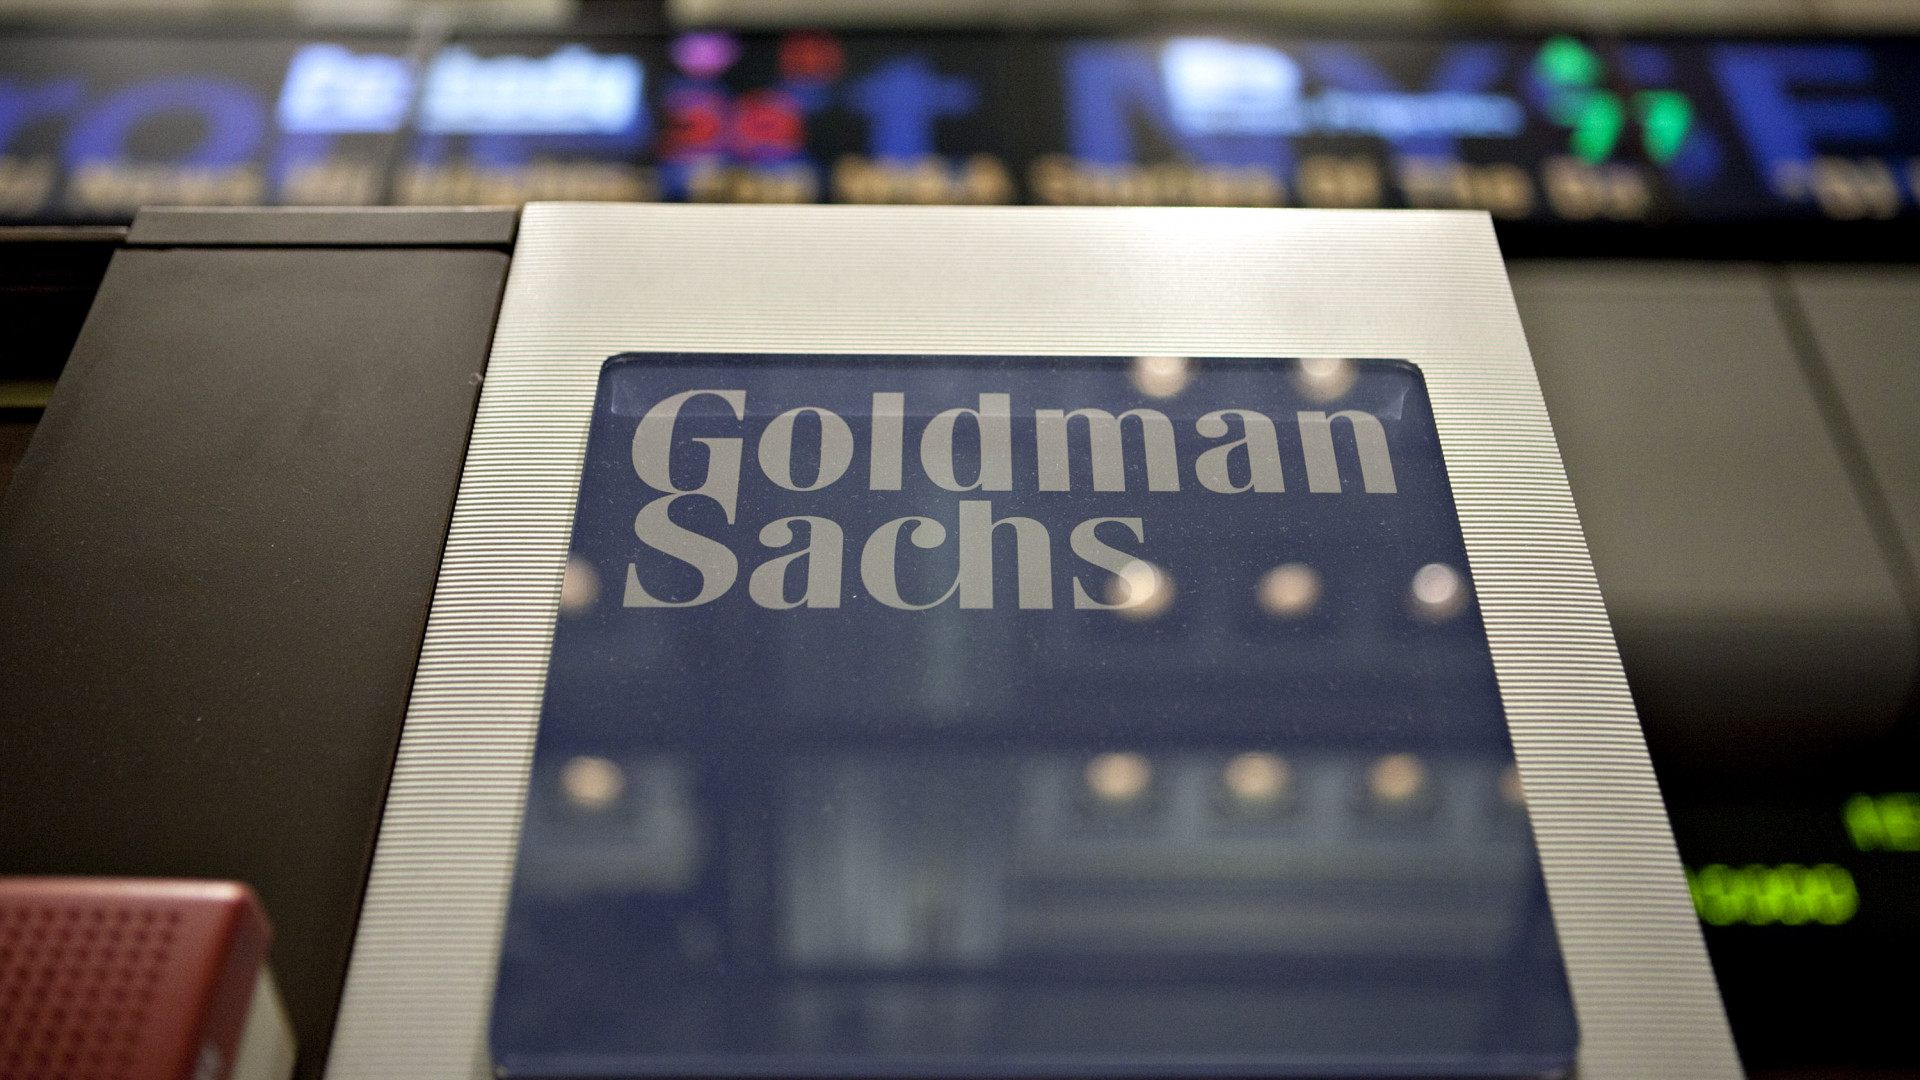 Goldman Sachs Archives | Bitcoinhungary